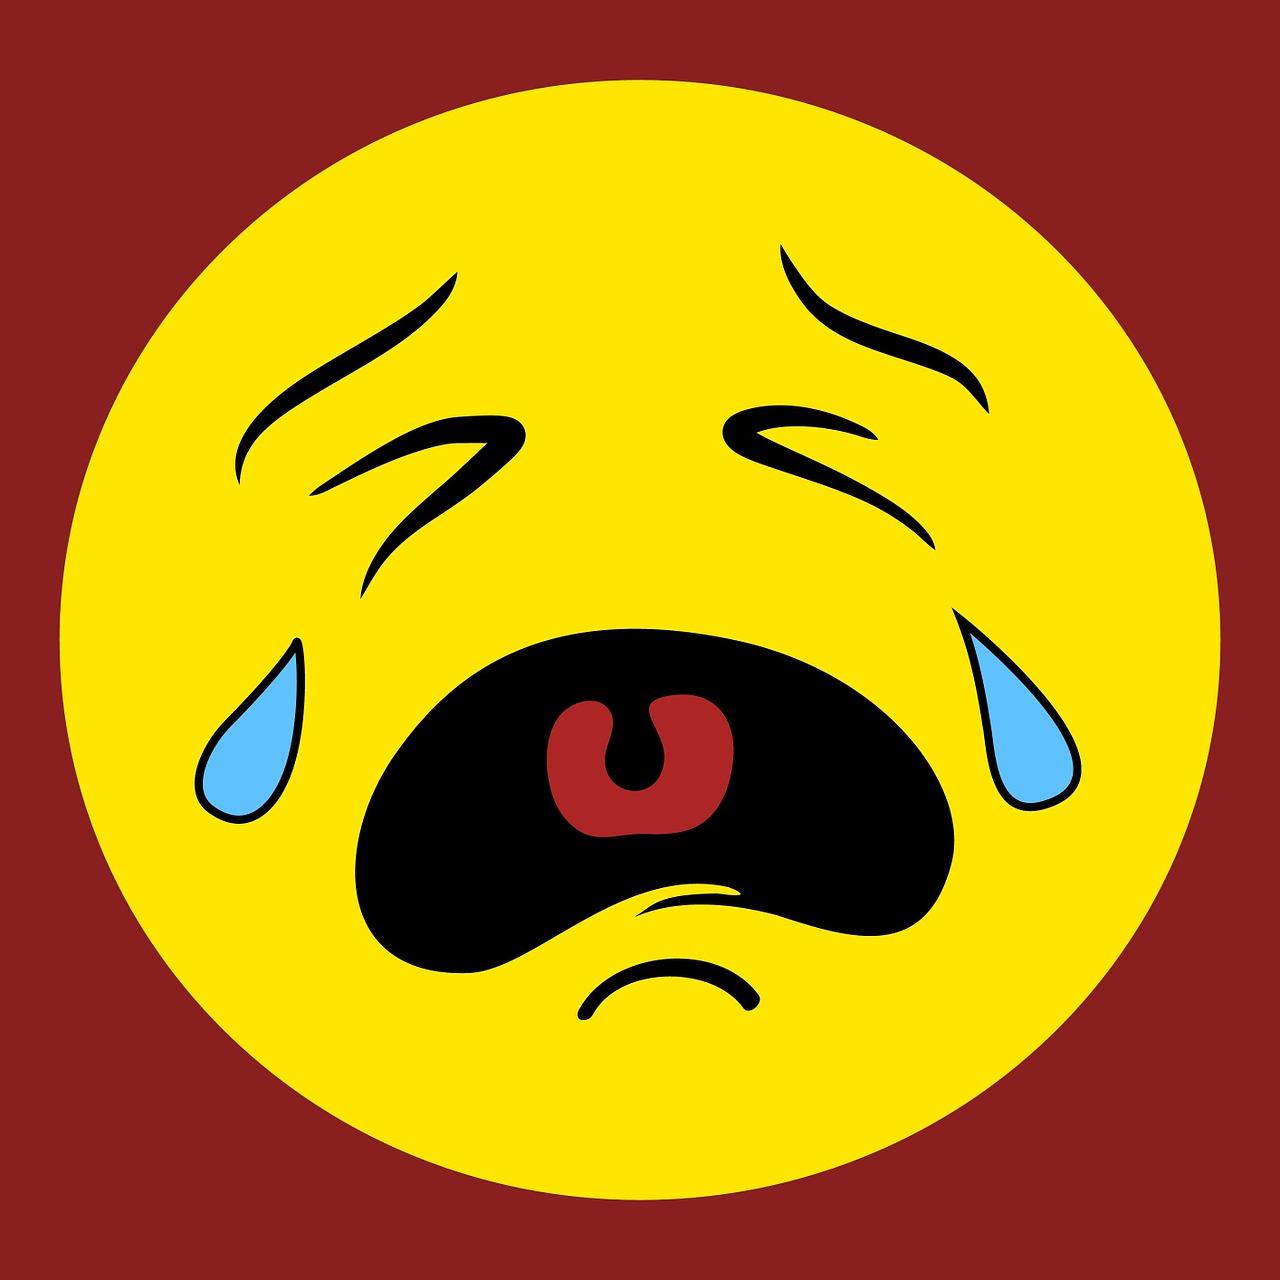 Картинка плачущий смайлик